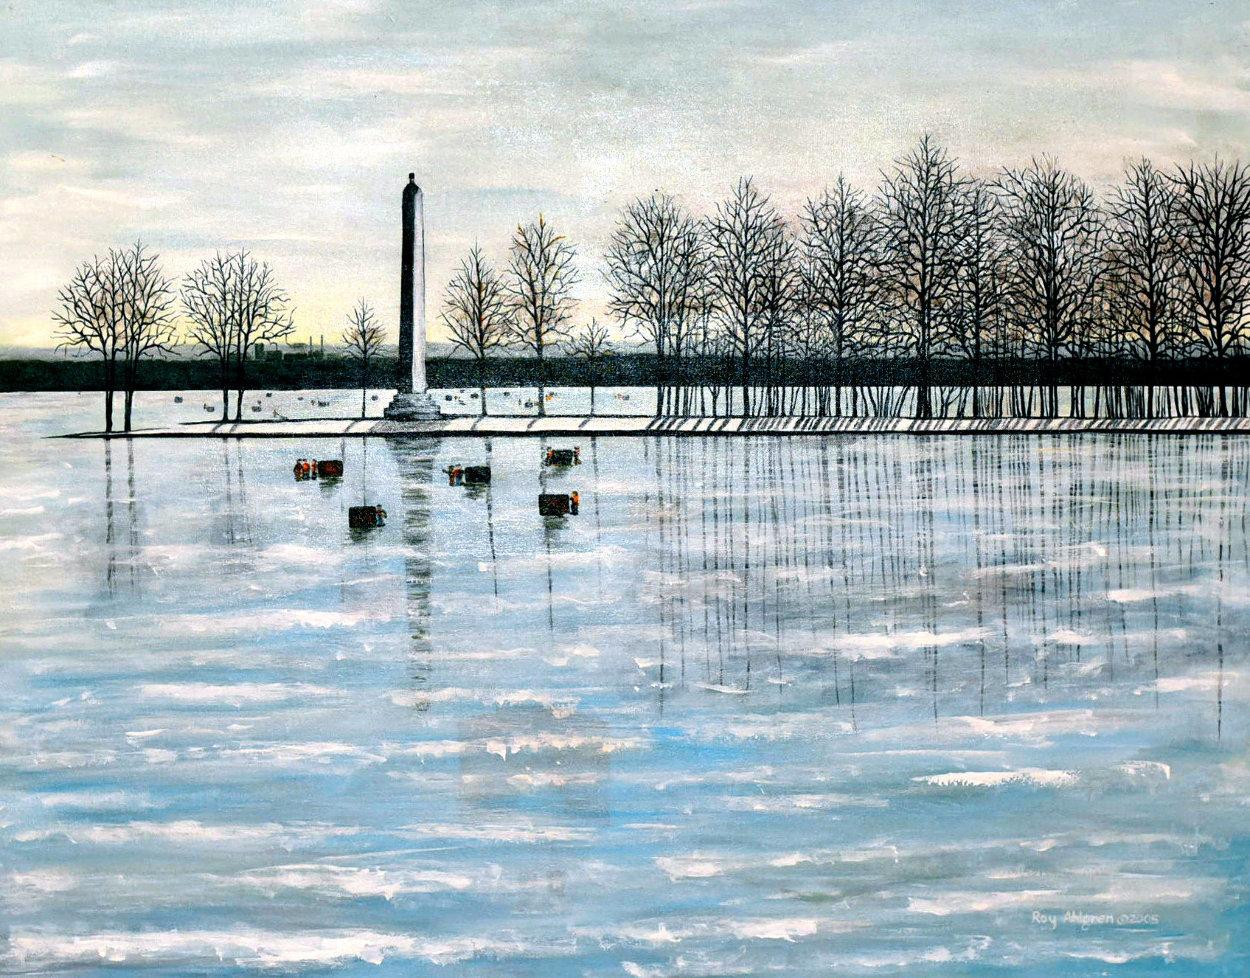 Misery Bay, Winter 2011 26x32 Pennsylvania Original Painting by Roy Ahlgren